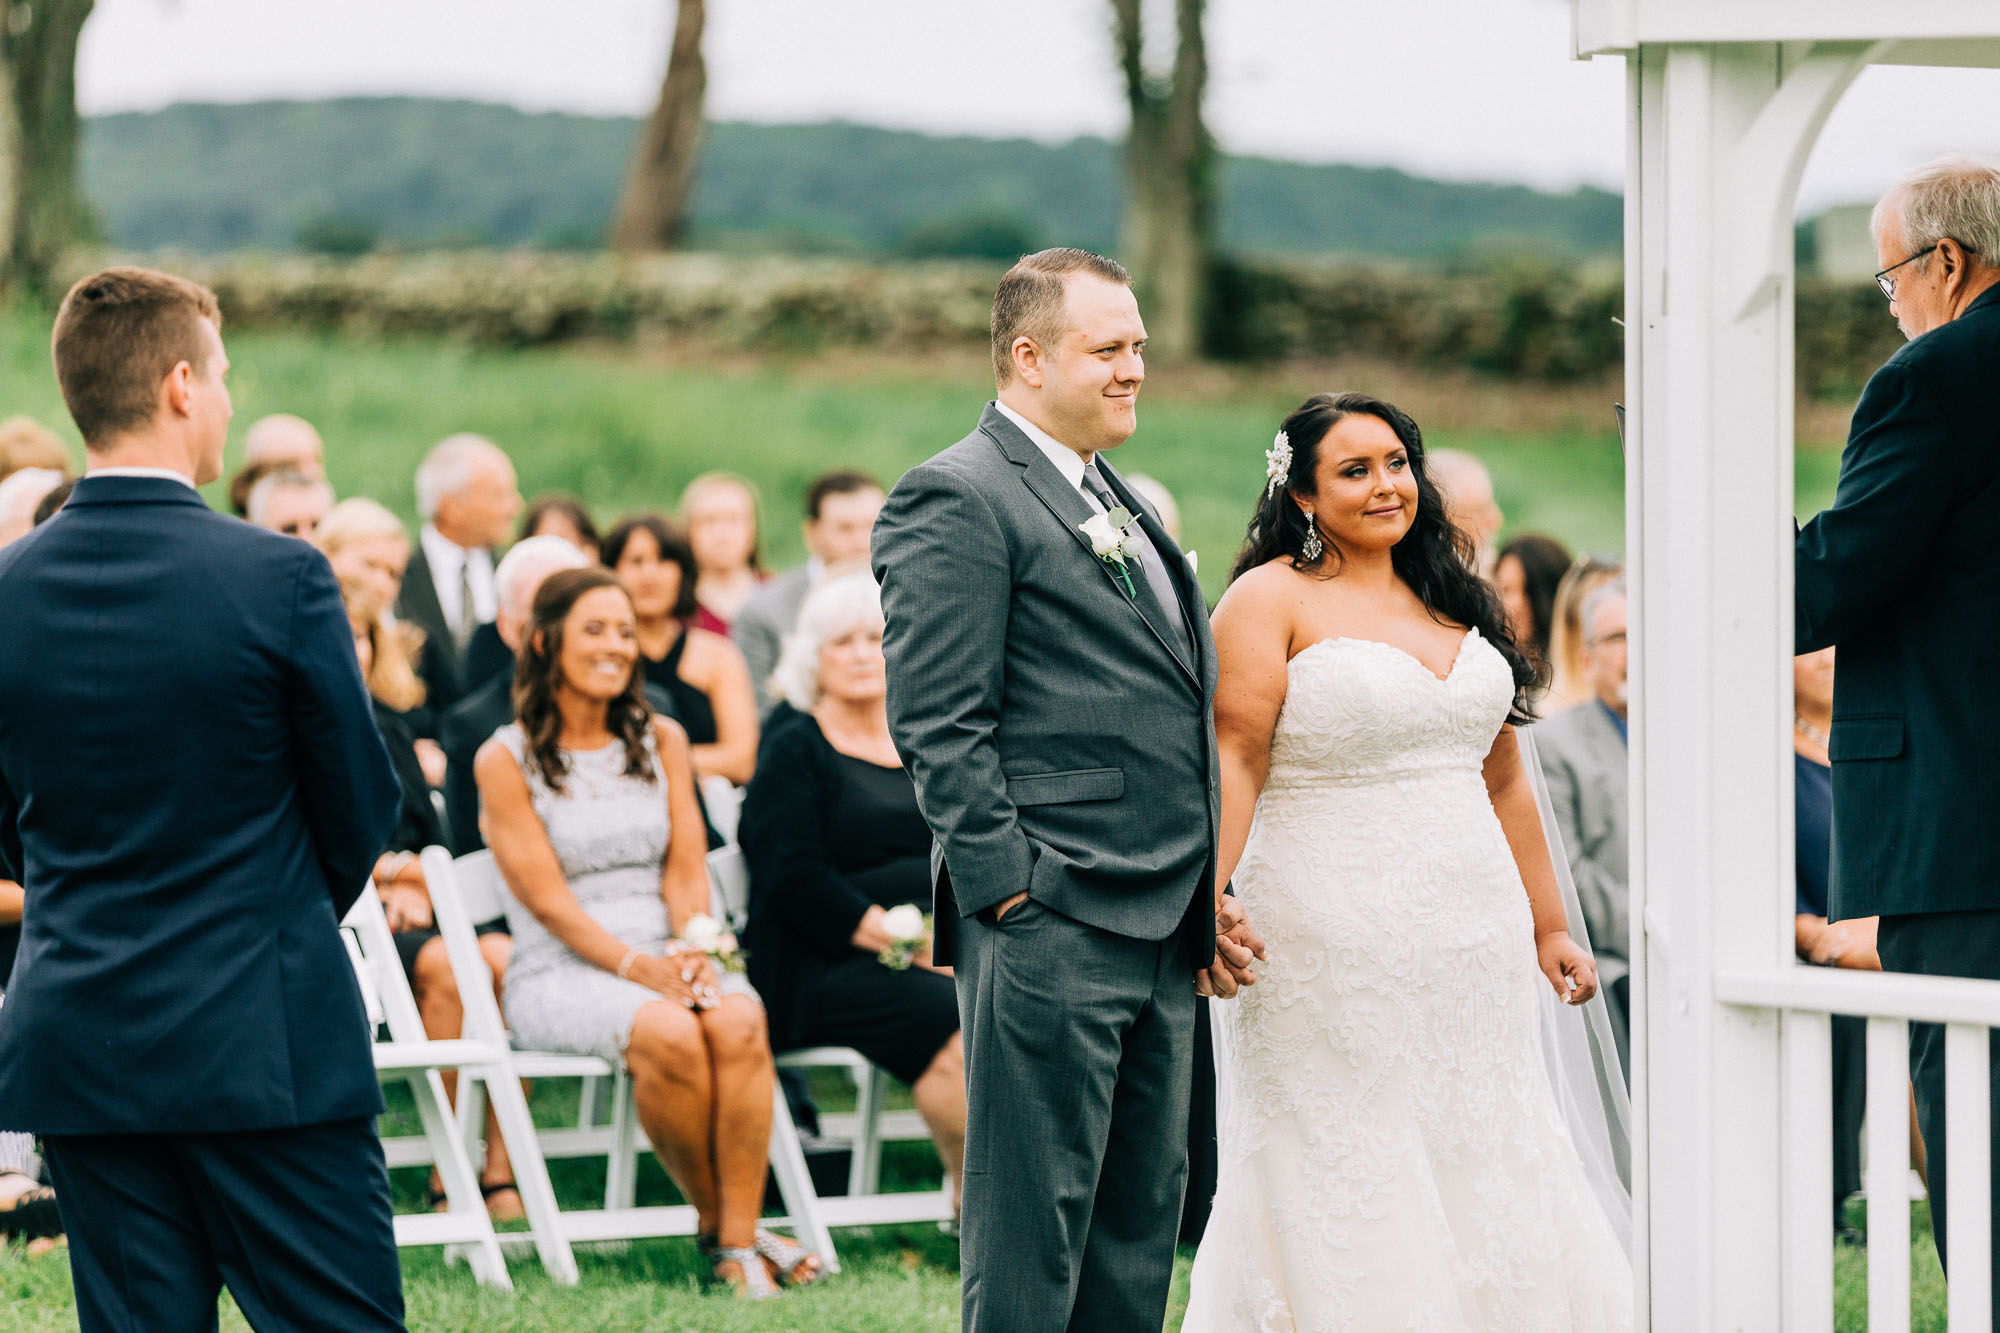 stonhedge-country-club-wedding-8313.jpg